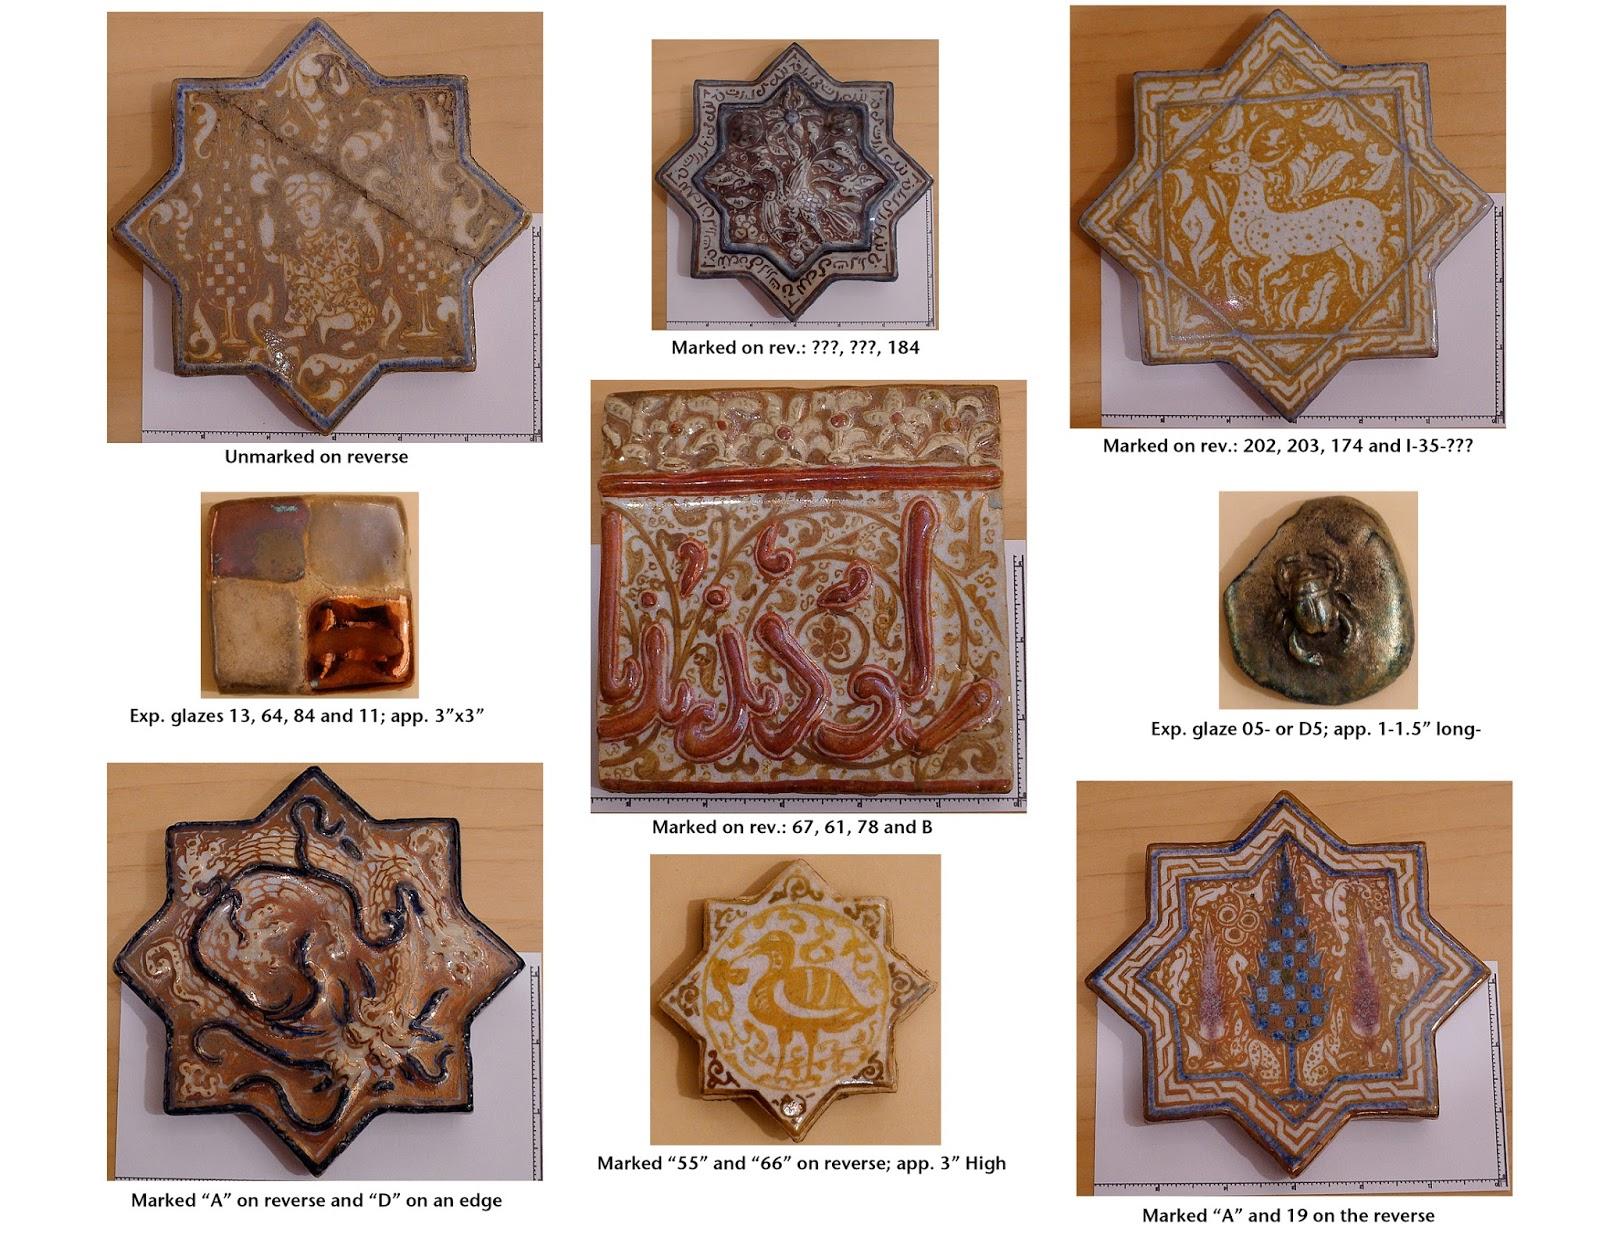 architectural tiles glass and ornamentation in new york the architectural tiles glass and ornamentation in new york the experimental lustre tiles of rafael guastavino jr